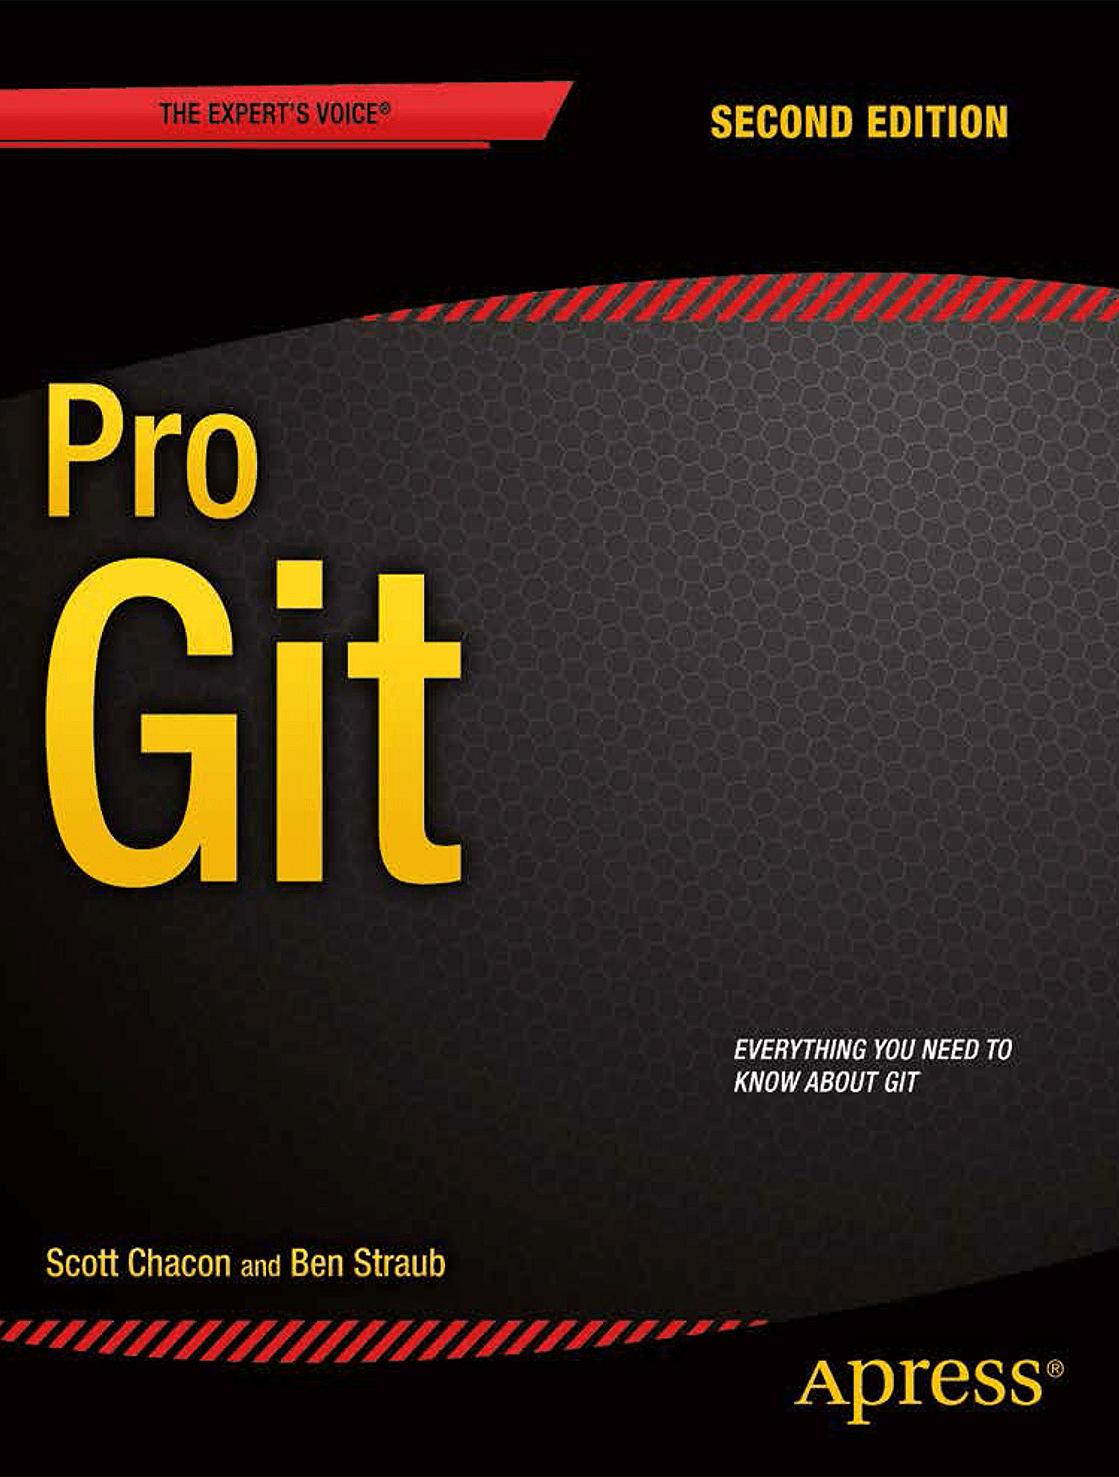 Pro Git 日本語版電子書籍公開サイト